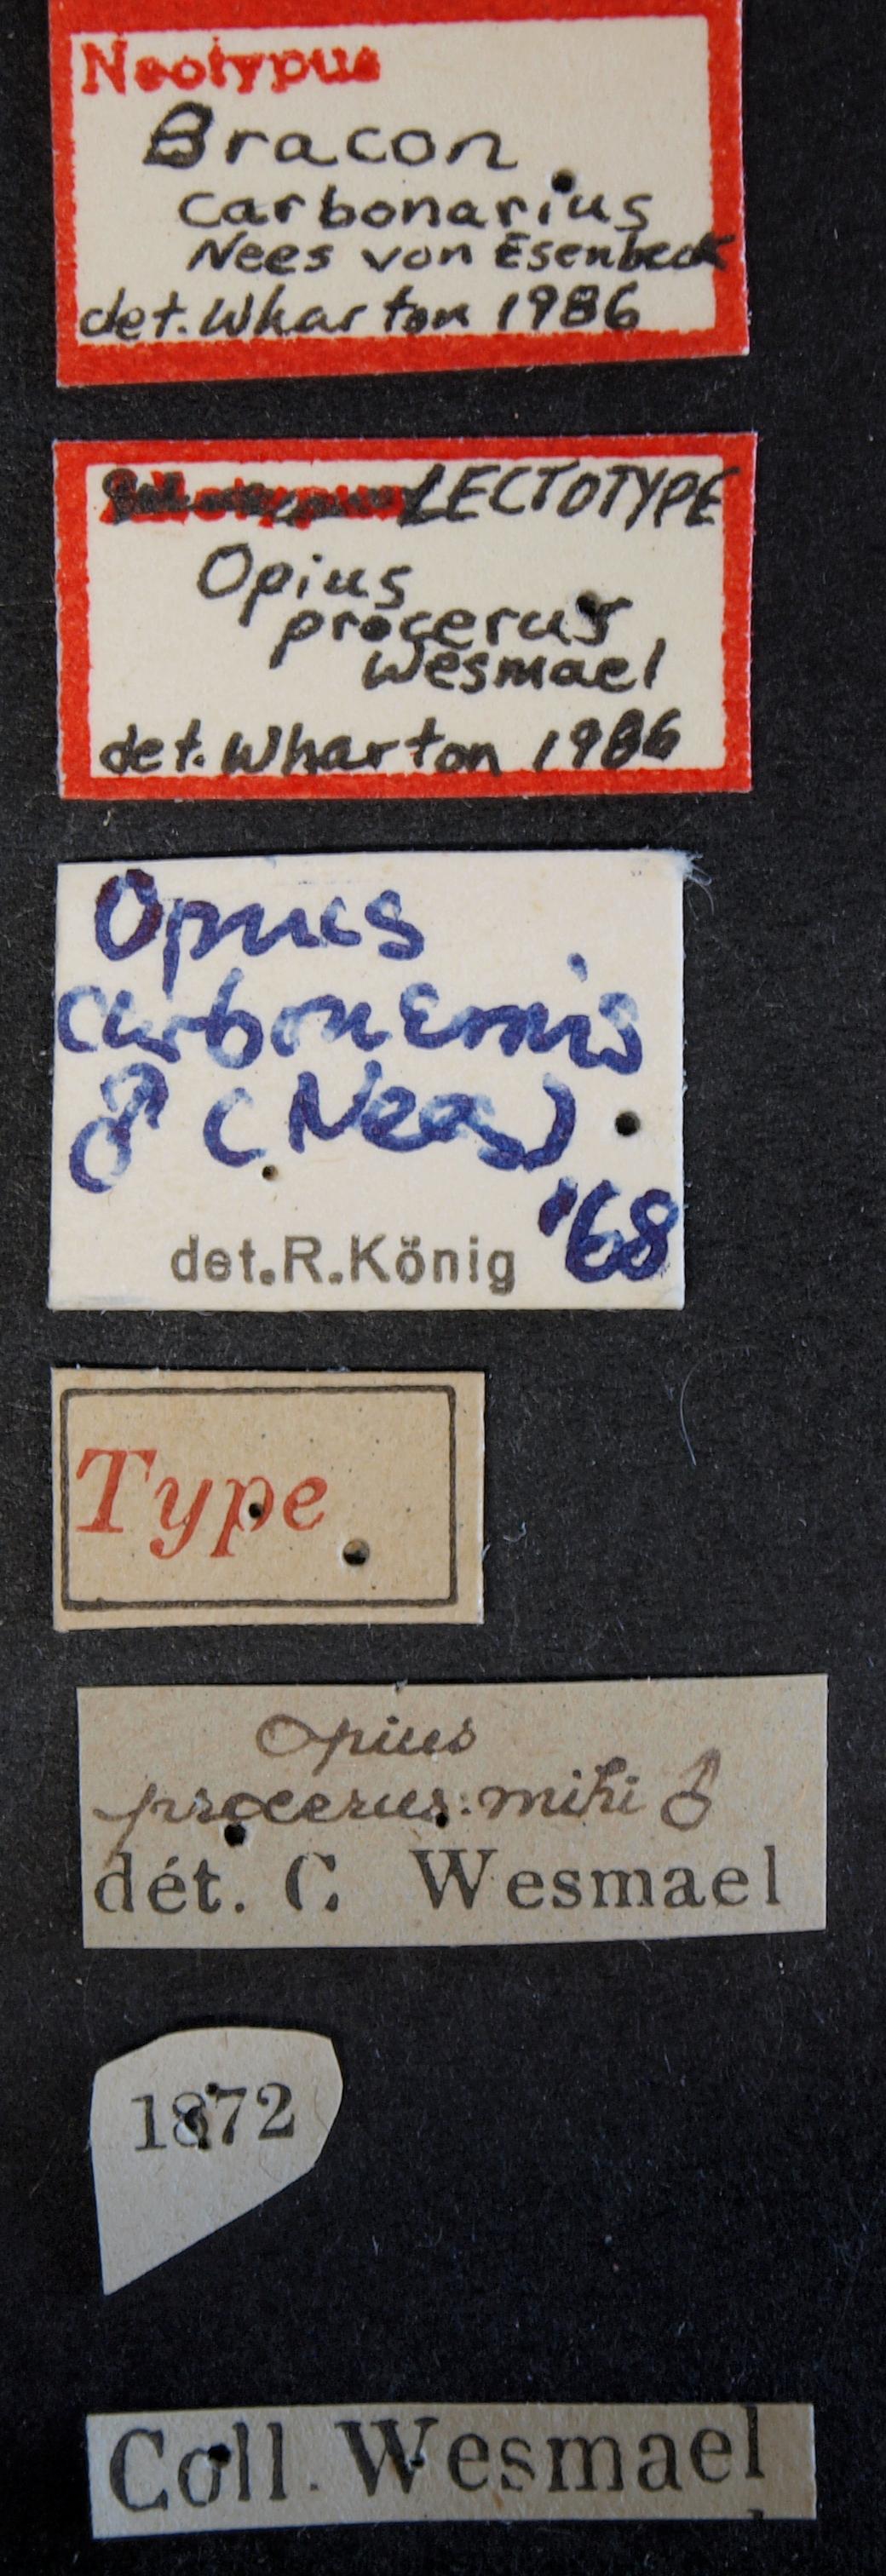 Opius procerus lct Lb.JPG